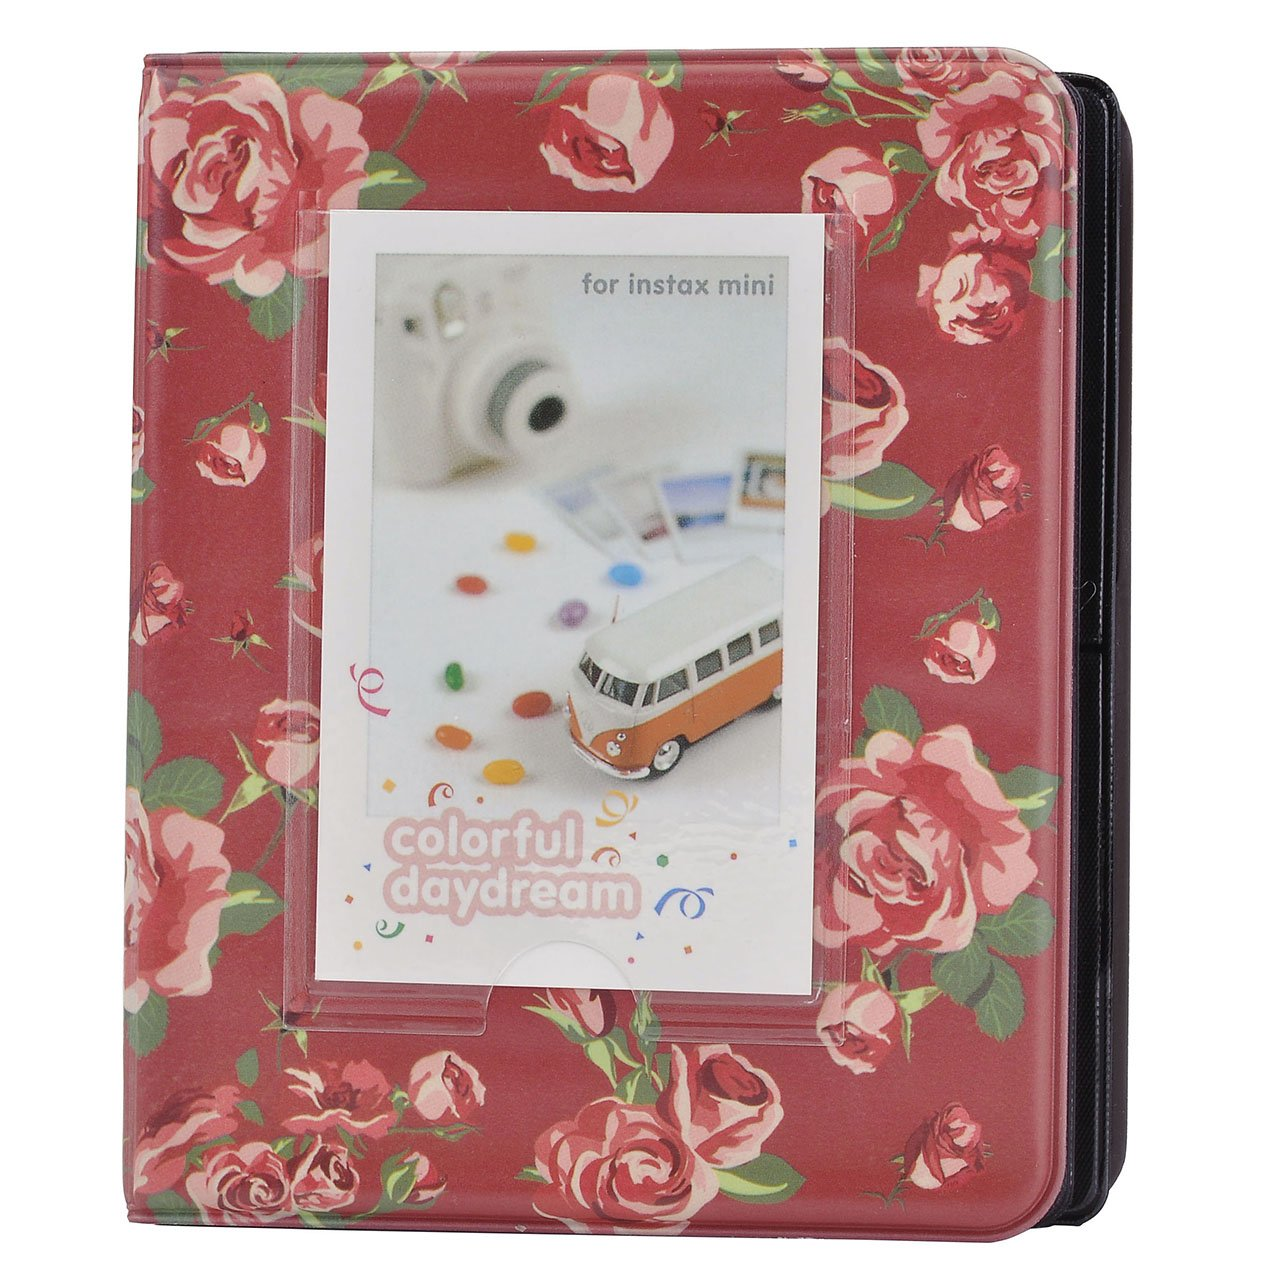 Mogoko 64 Taschen Fotoalbum Geeignet Fuer Fujifilm Instax Mini Album Kamera Polaroid 2nan Colorful Mini7s 8 90 25 50s Pringo231 Share Sp 1 2 Pic 300 Z2300